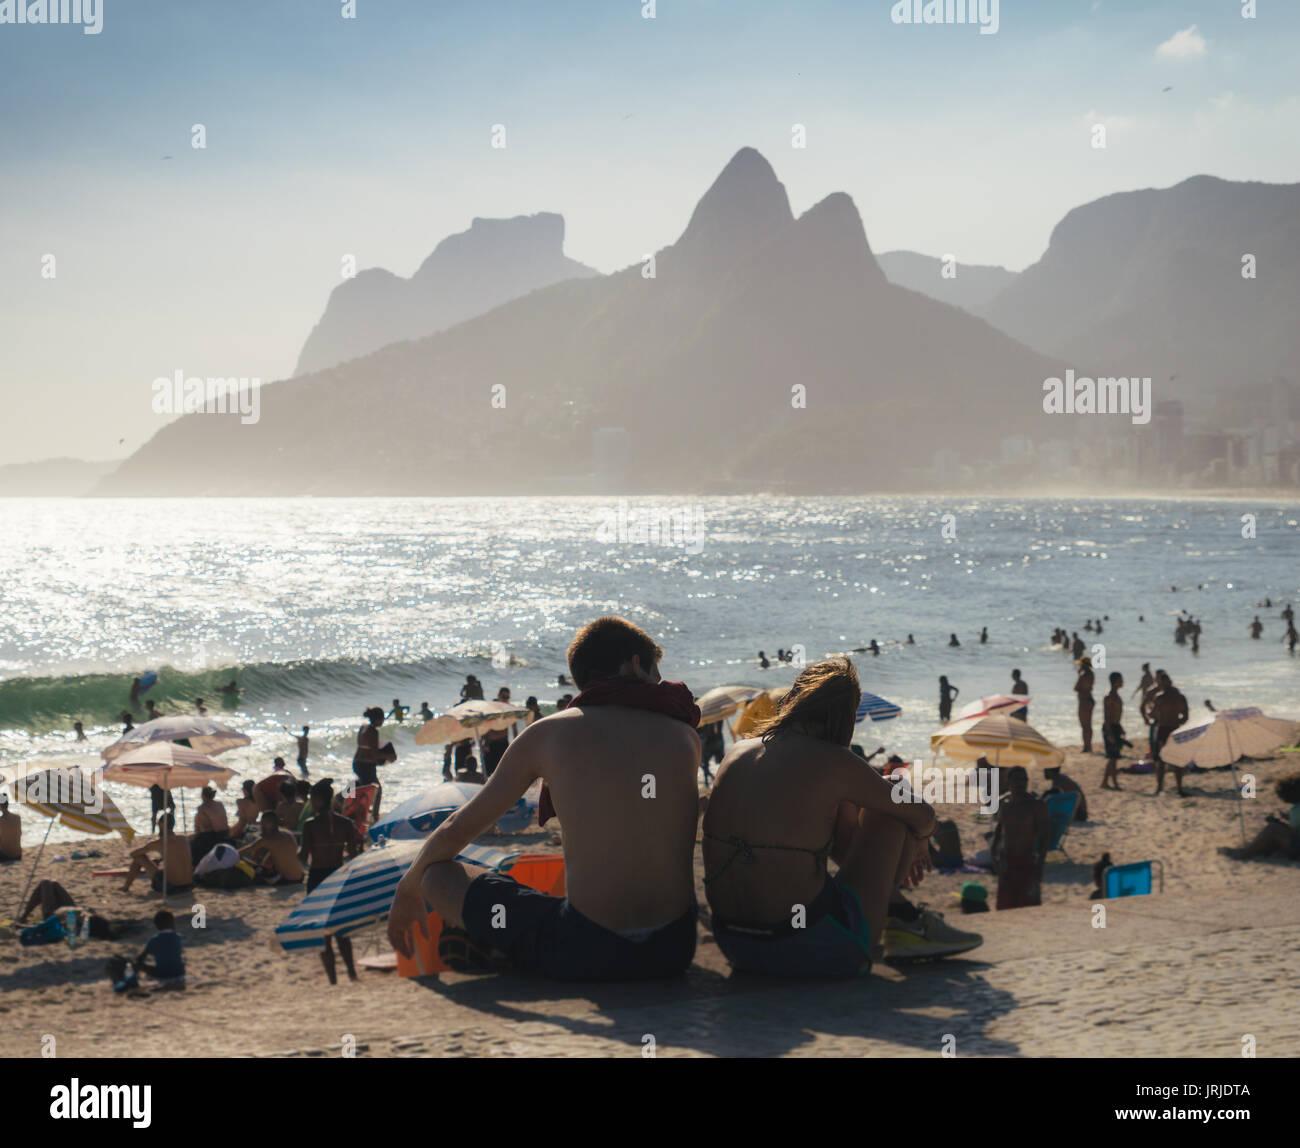 girl ipanema couples in love on the beach